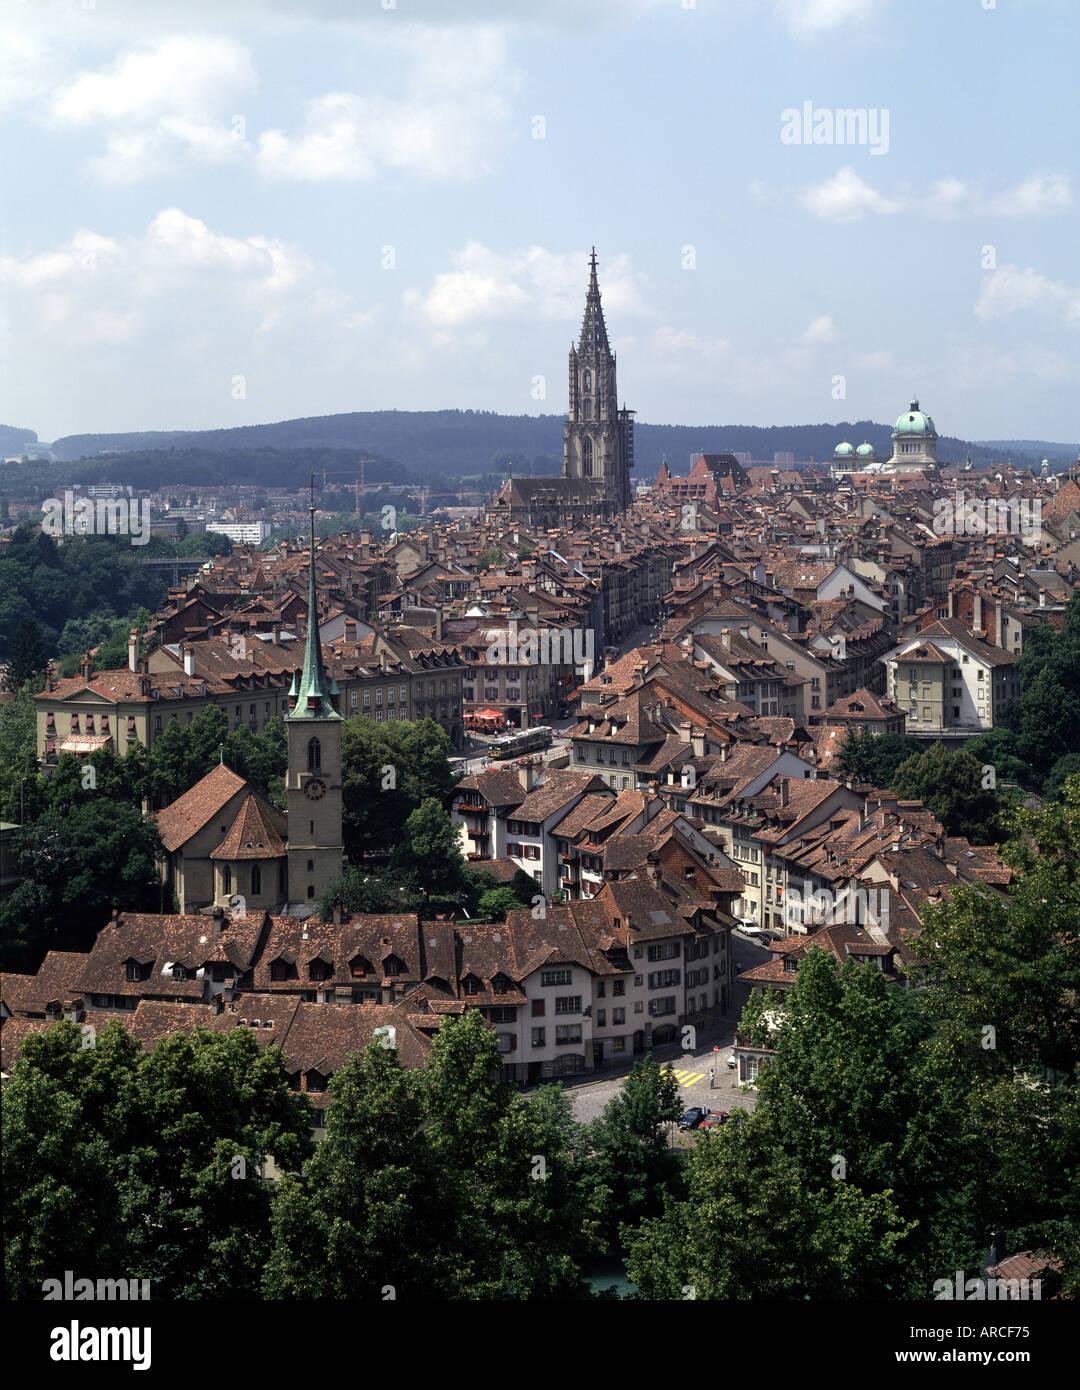 Küchenladen Bern Altstadt ~ bern, altstadt, von osten, blick vom rosengarten stock